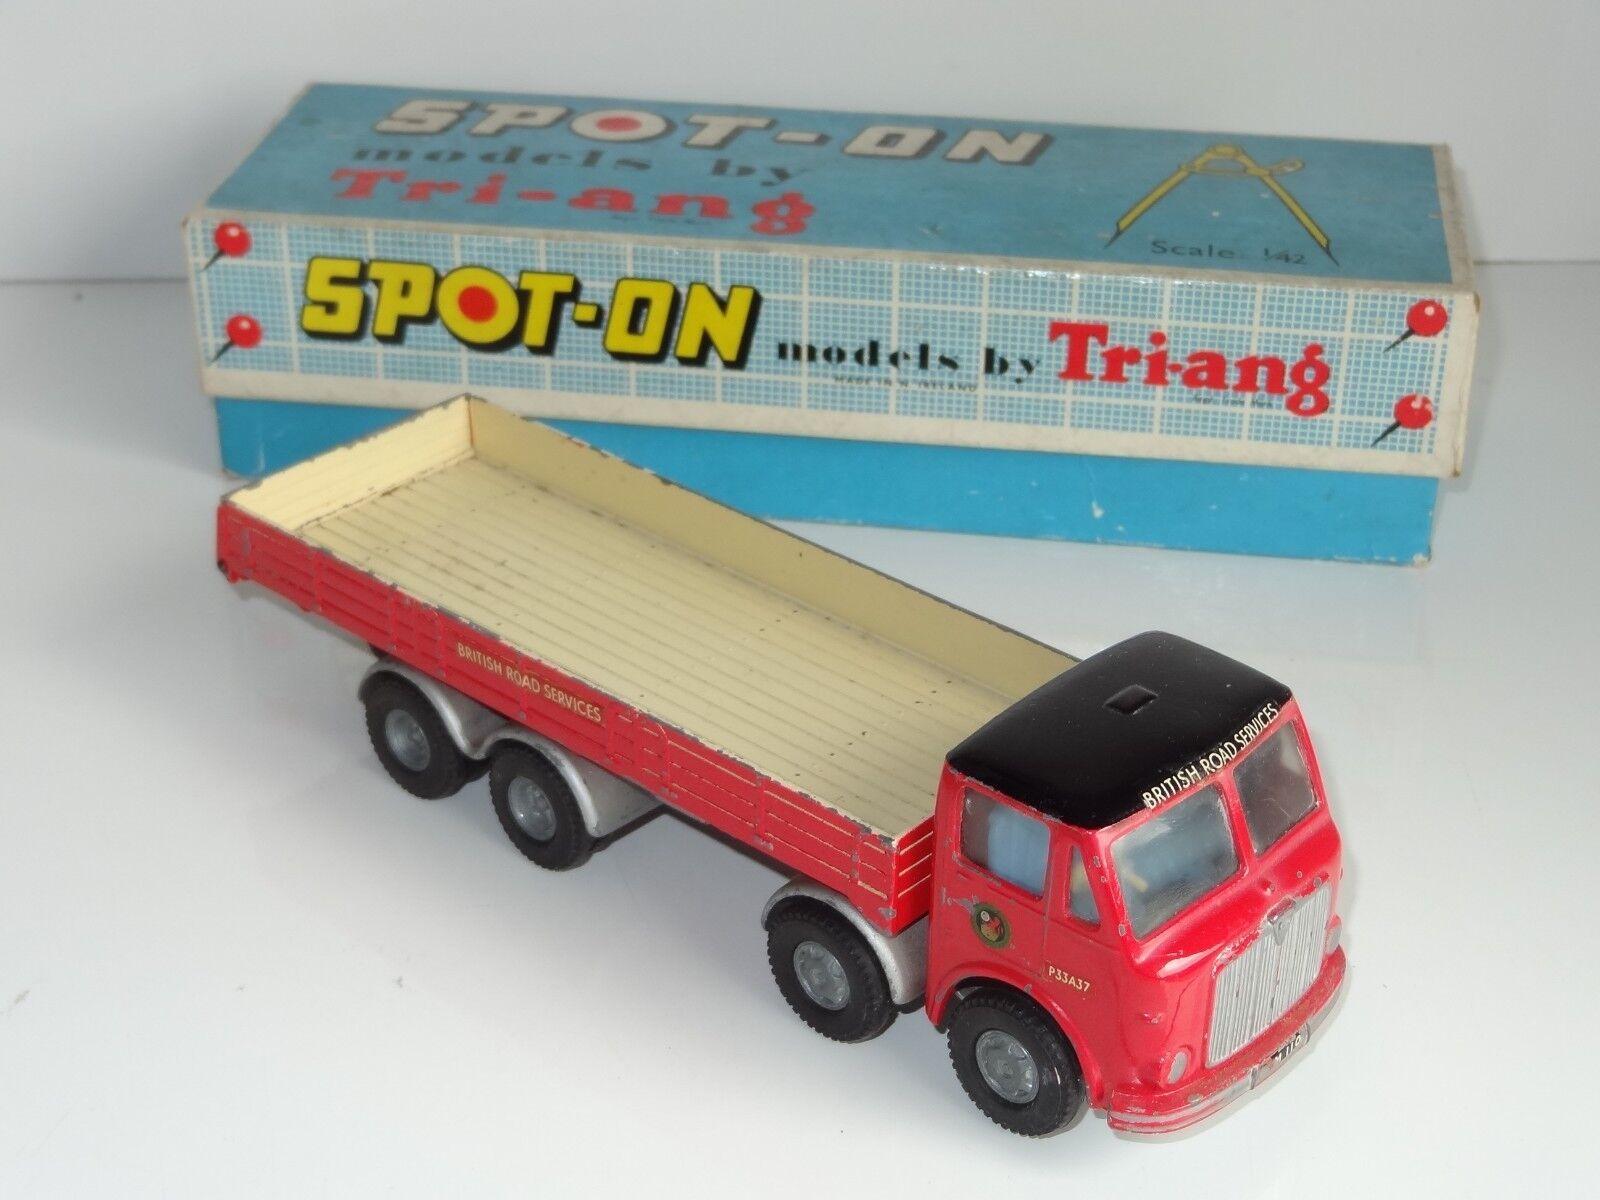 (a) (a) (a) Triang punto en servicios de carretera AEC británica - 110 3 6a792c